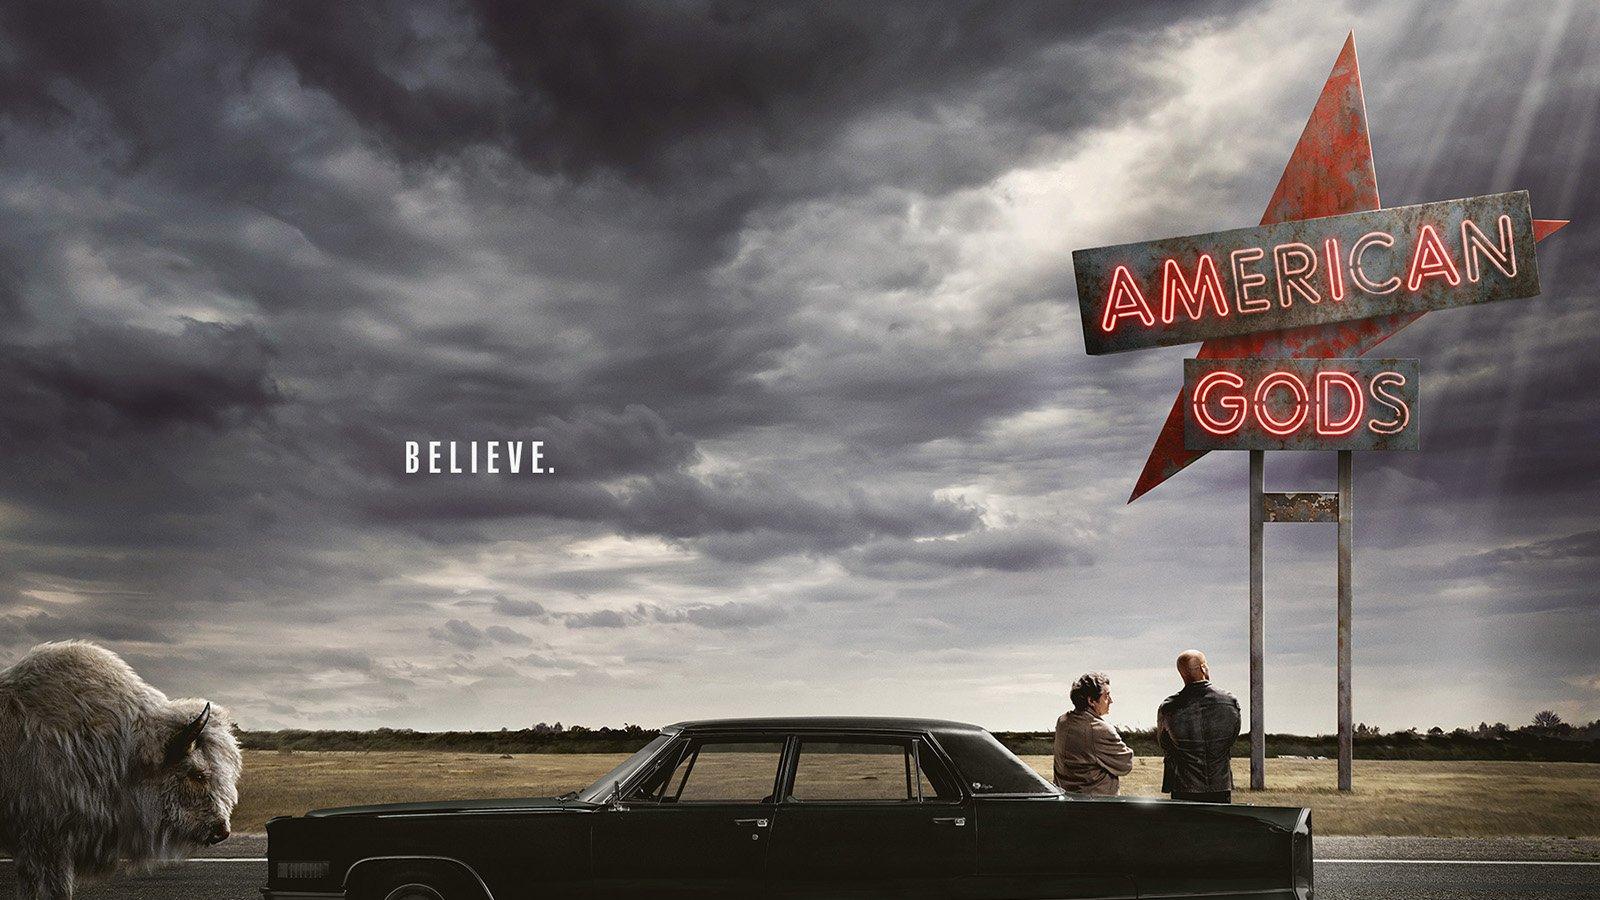 Американские боги / American Gods (3 сезон)